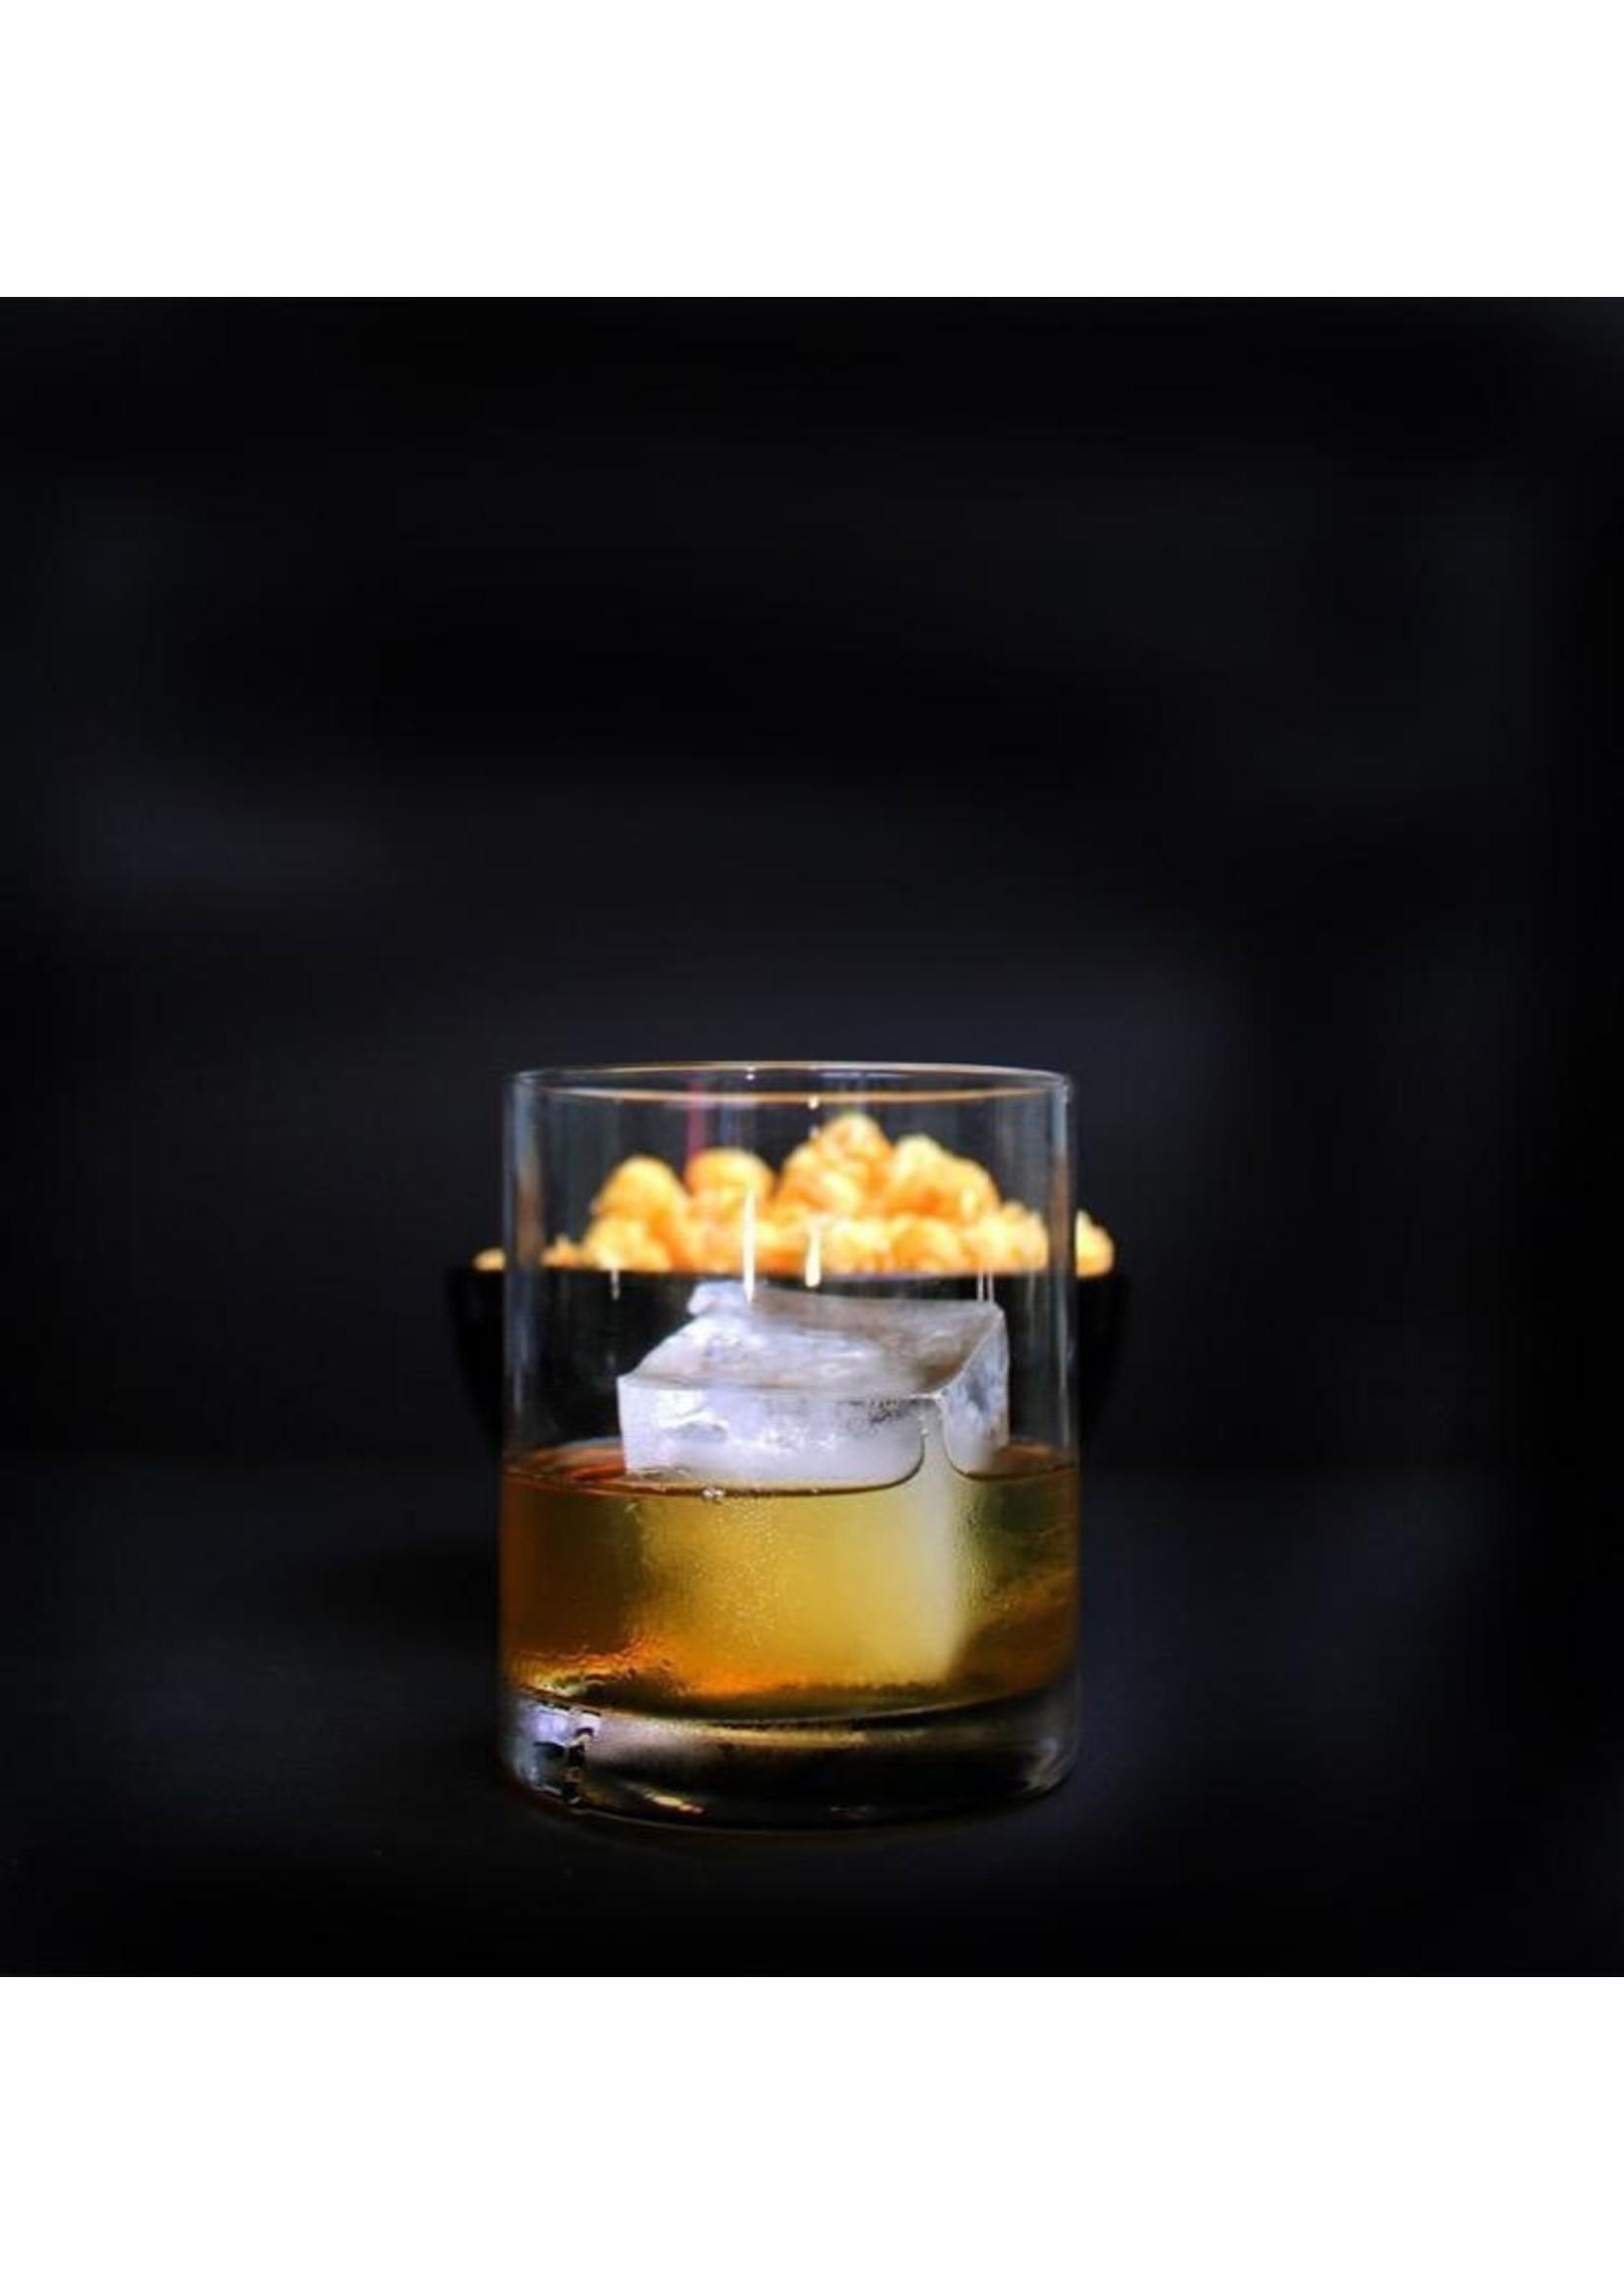 Eatable Whiskey On The Pops